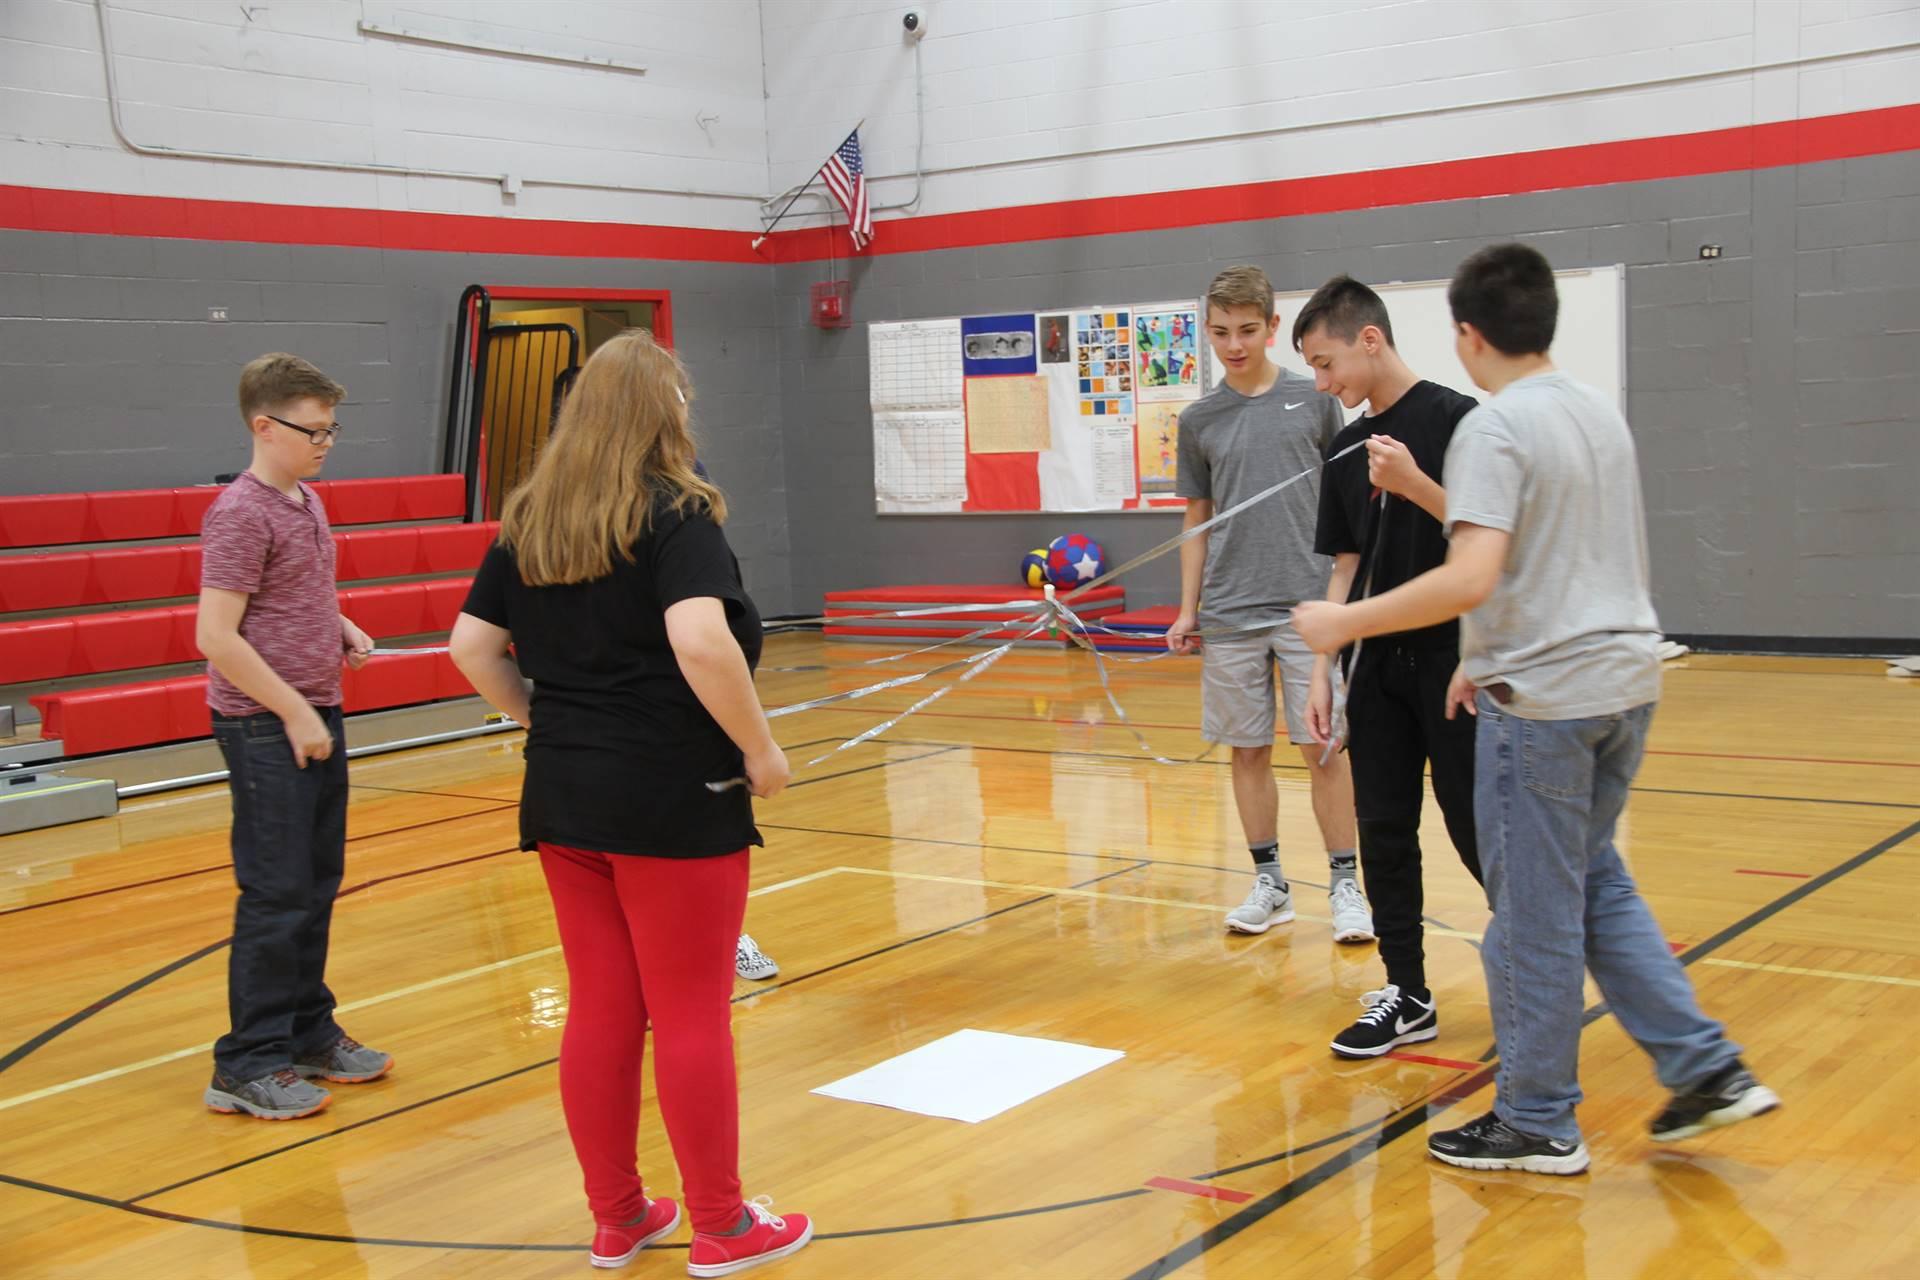 middle school students begin teamwork drawing challenge